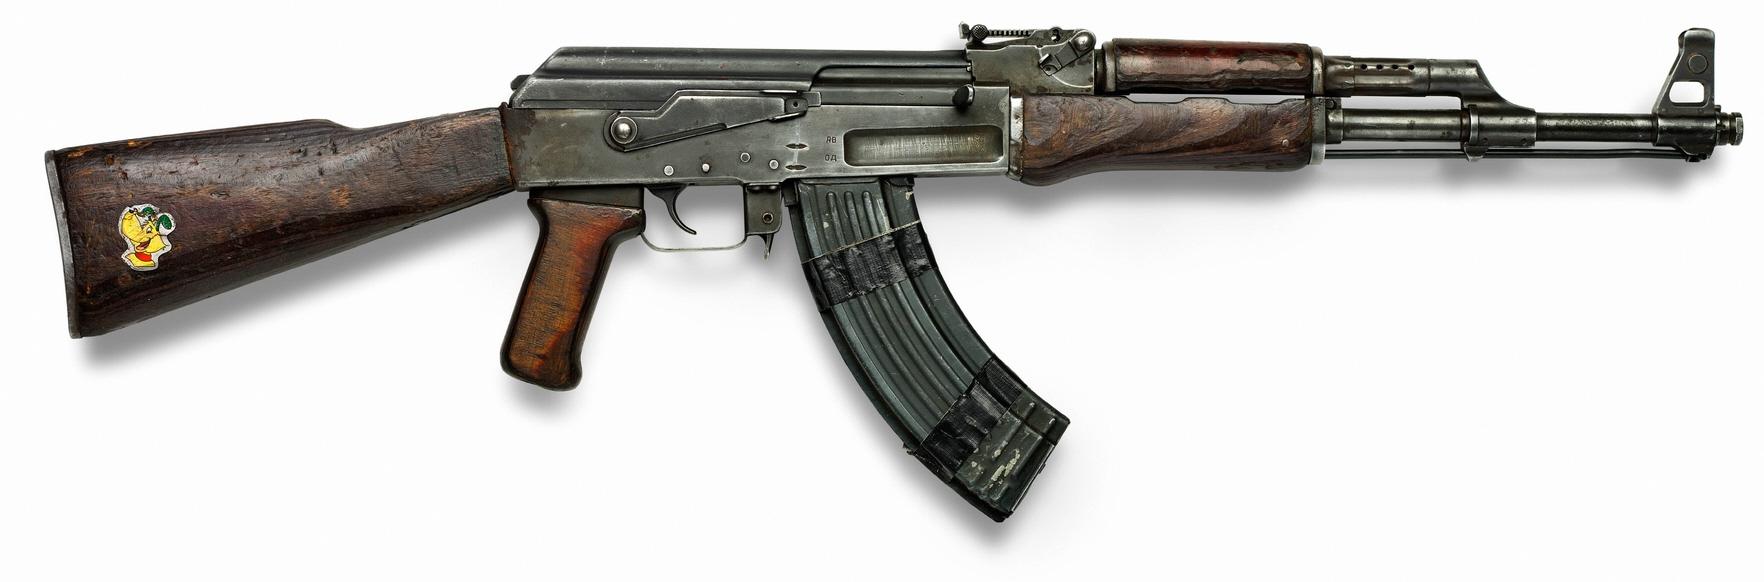 Resenha da Arma AK-47